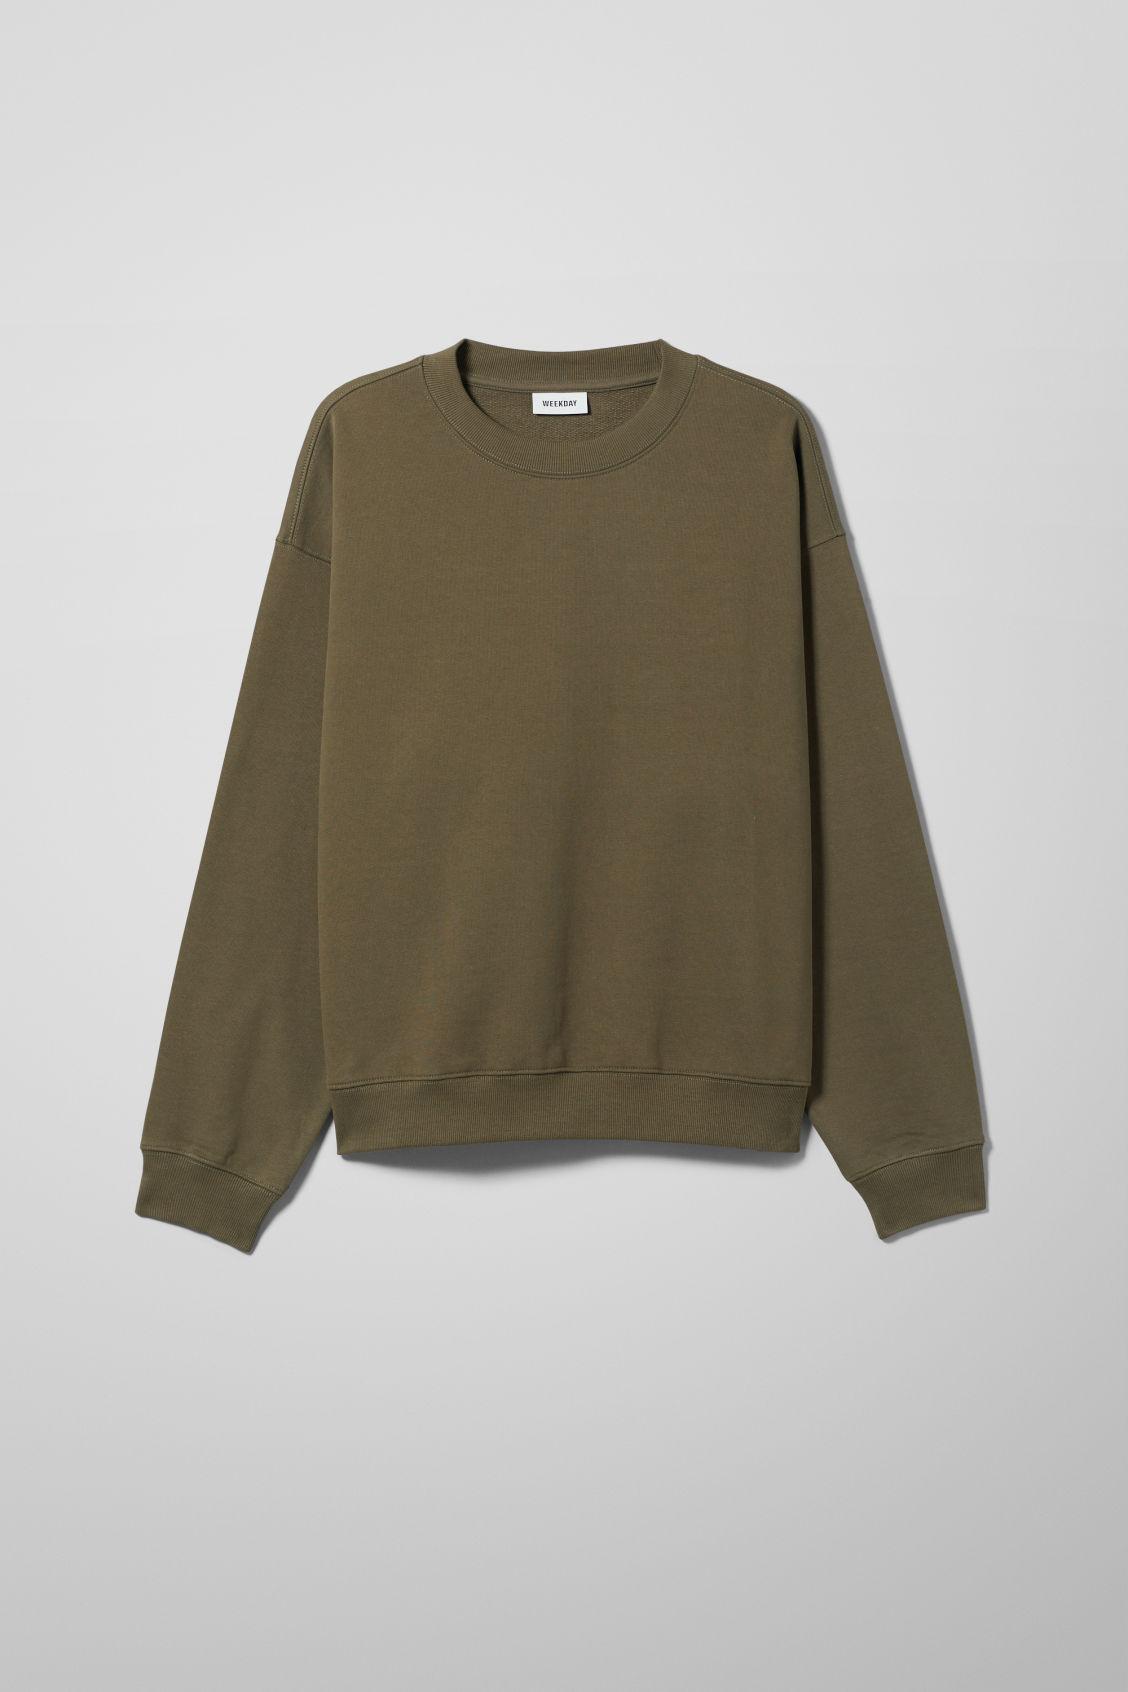 Willy Sweatshirt - Green